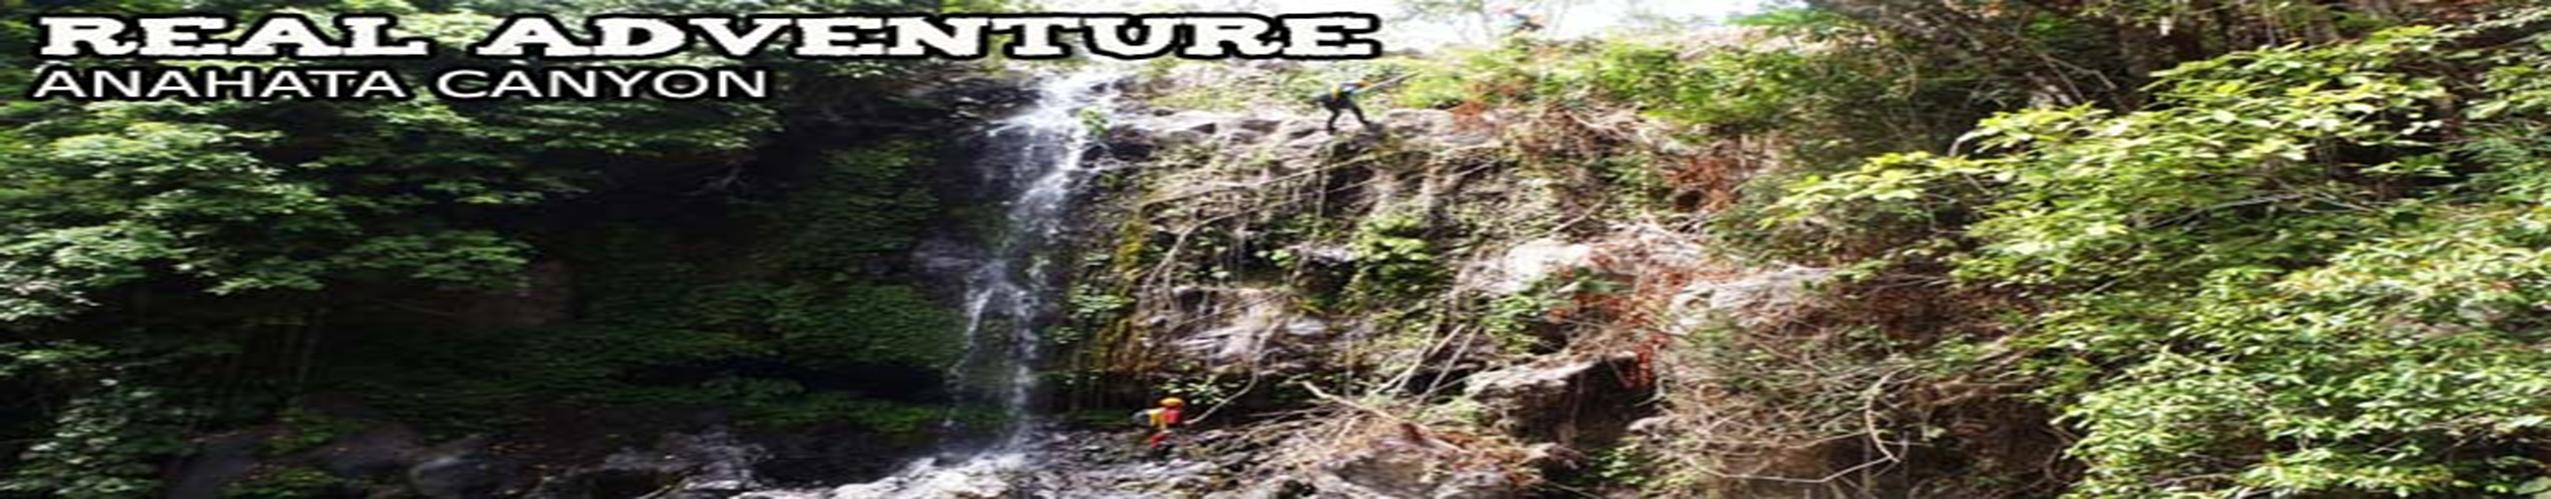 Adventure and Spirit